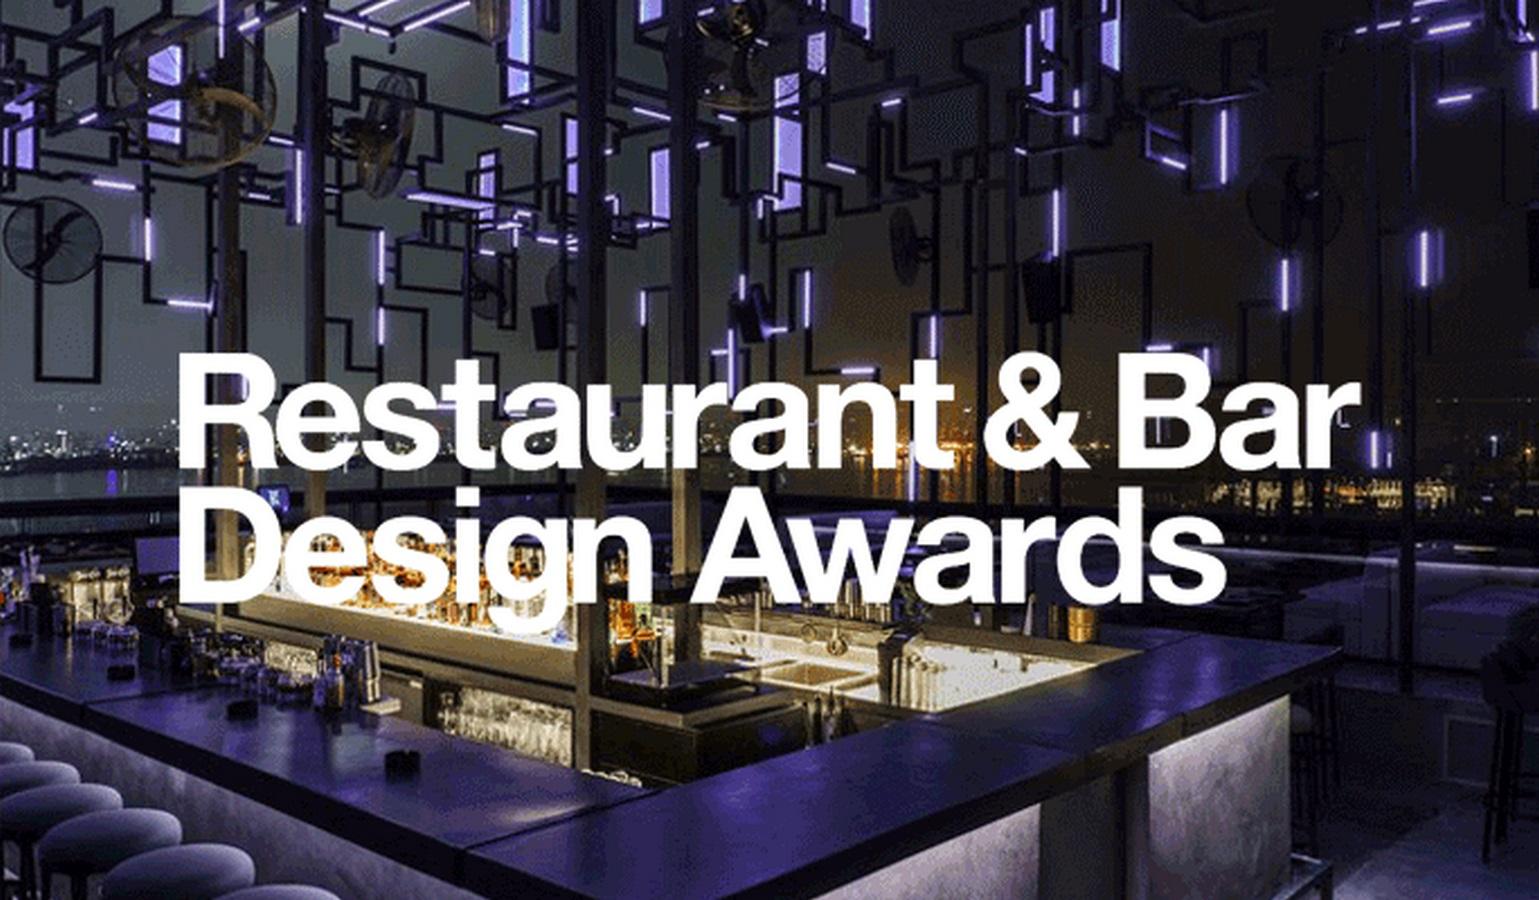 List of Interior Design awards - Sheet3